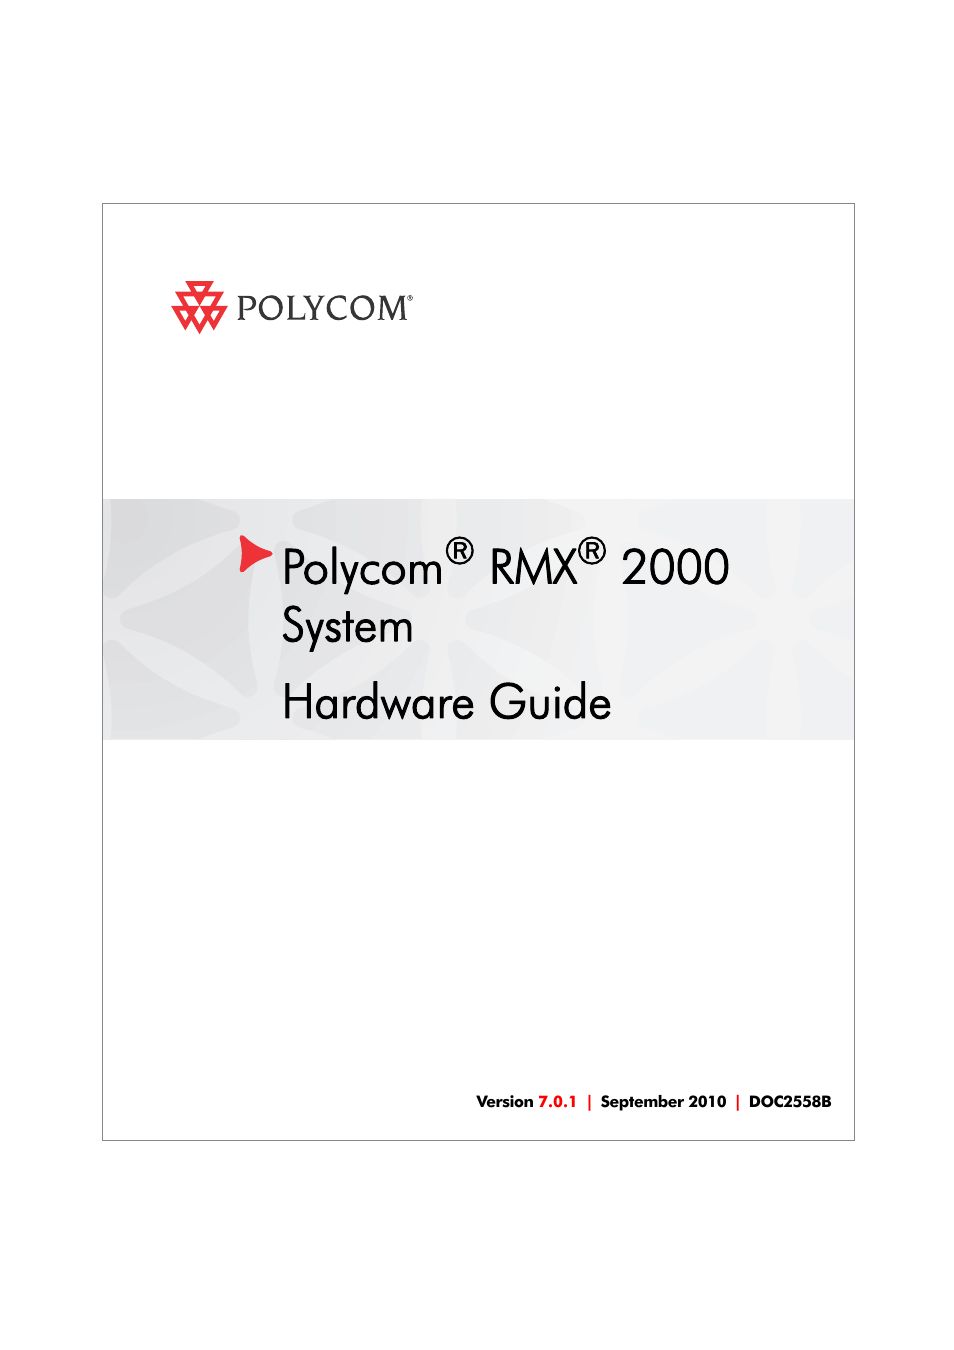 polycom doc2558b user manual 45 pages rh manualsdir com polycom rmx 2000 hardware guide polycom rmx 2000 hardware guide